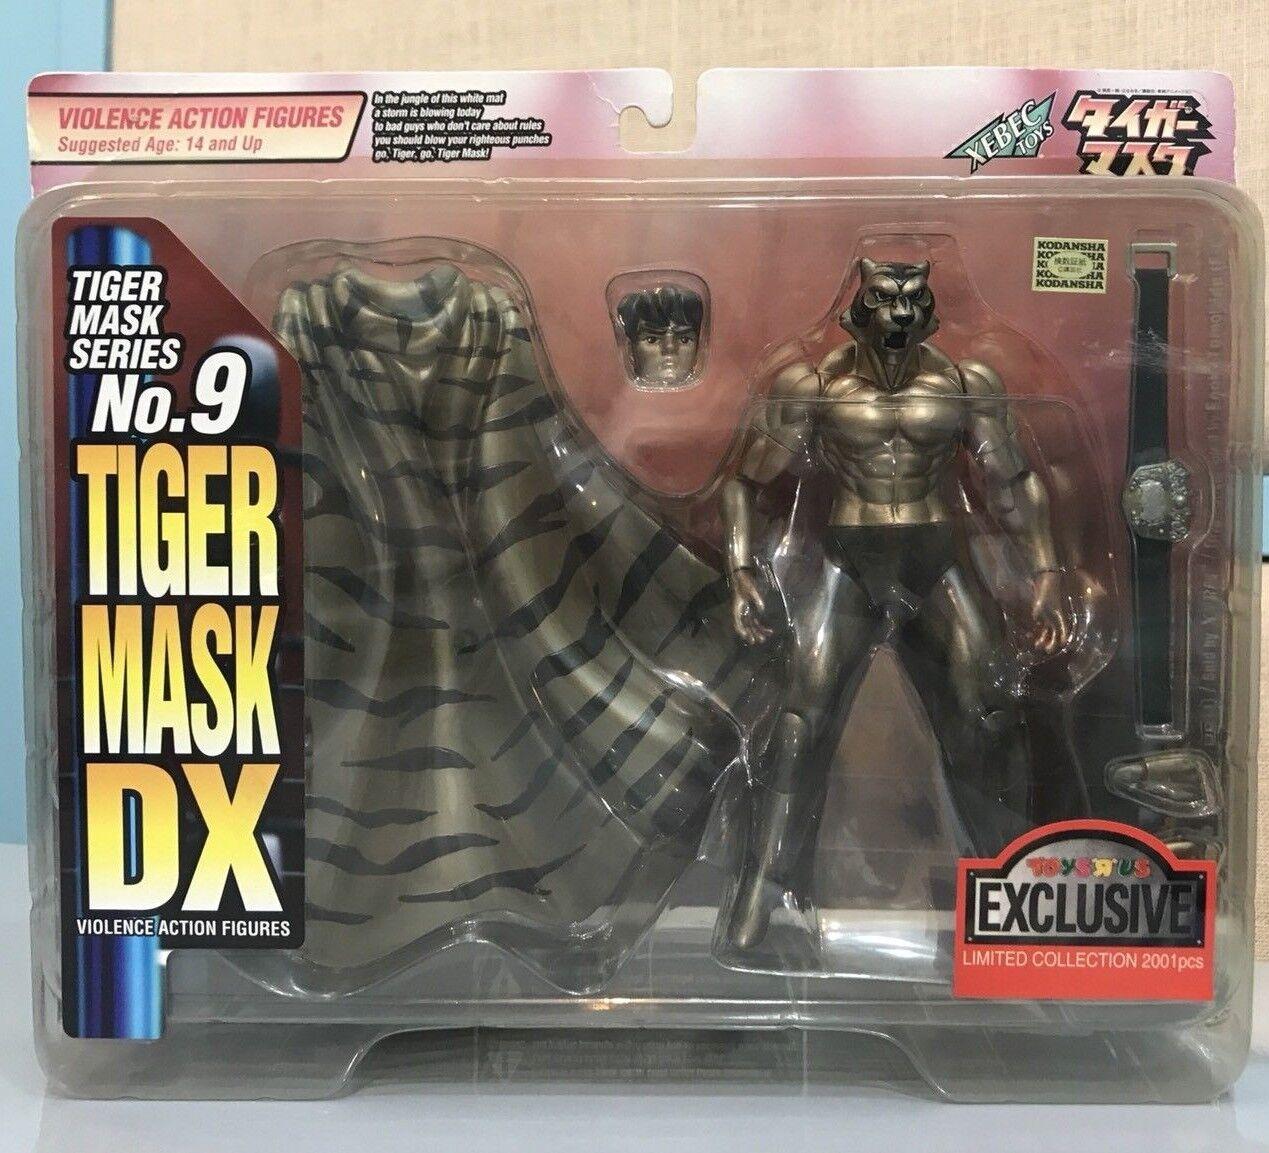 RARE KAIYODO Tiger Mask DX Violence Action Figures Tiger Mask Series No.9